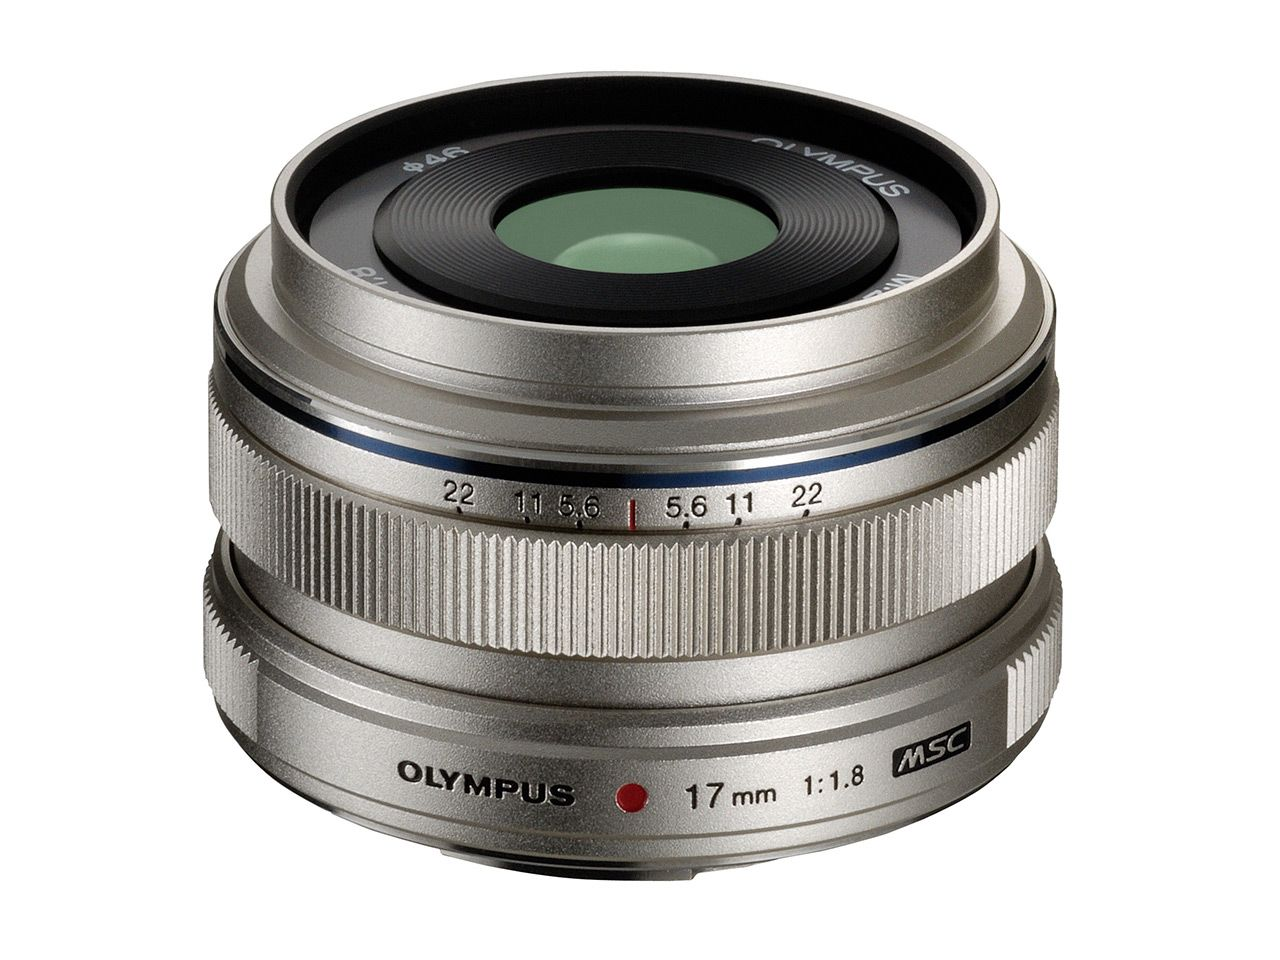 Olympus M.Zuiko Digital 17 mm f/1.8.Foto: Olympus